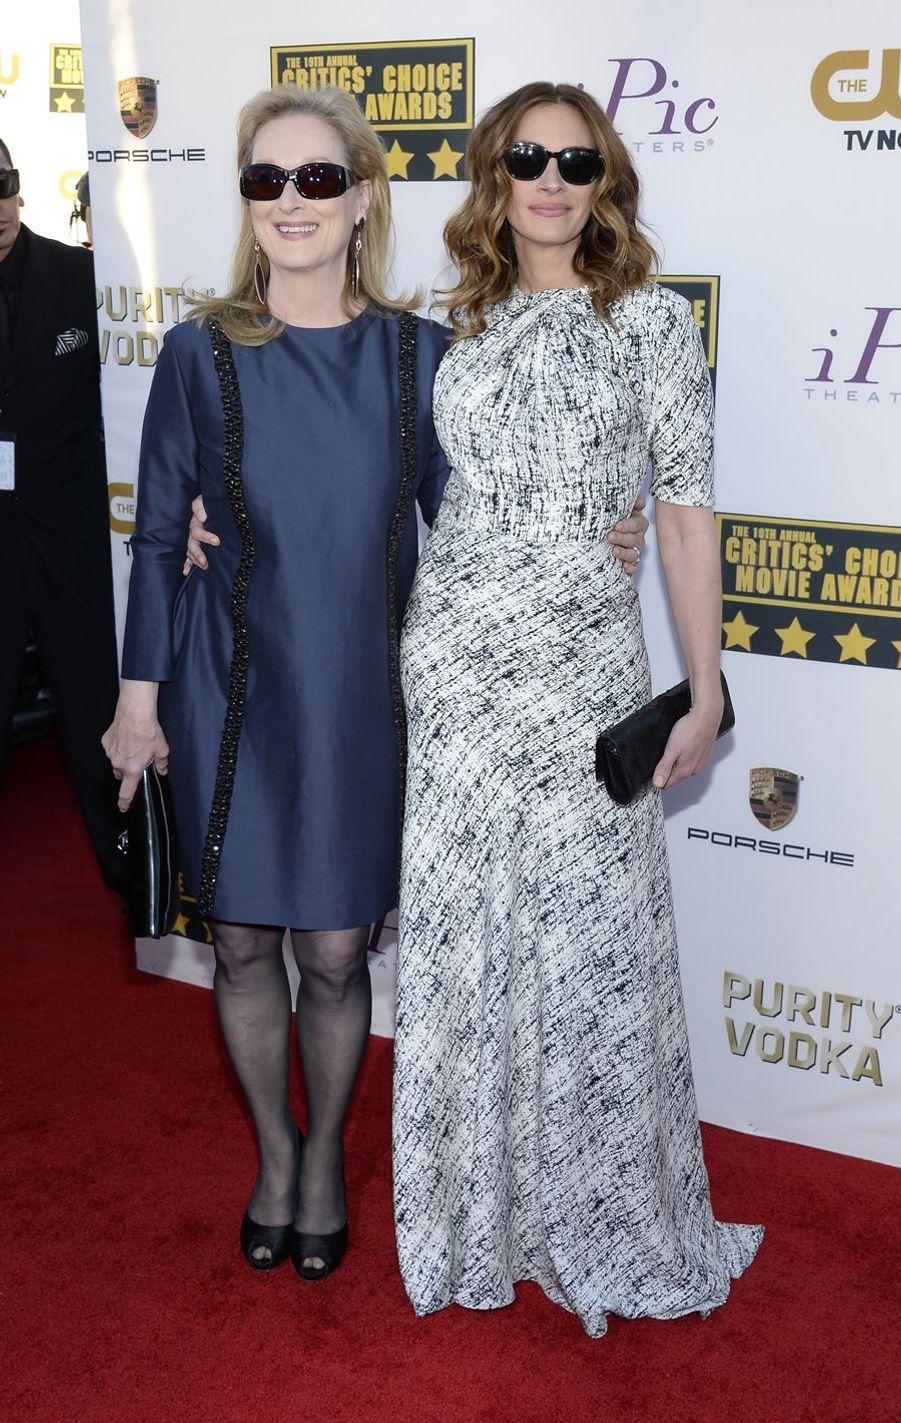 Meryl Streep et Julia Roberts à Santa Monica, le 16 janvier 2014